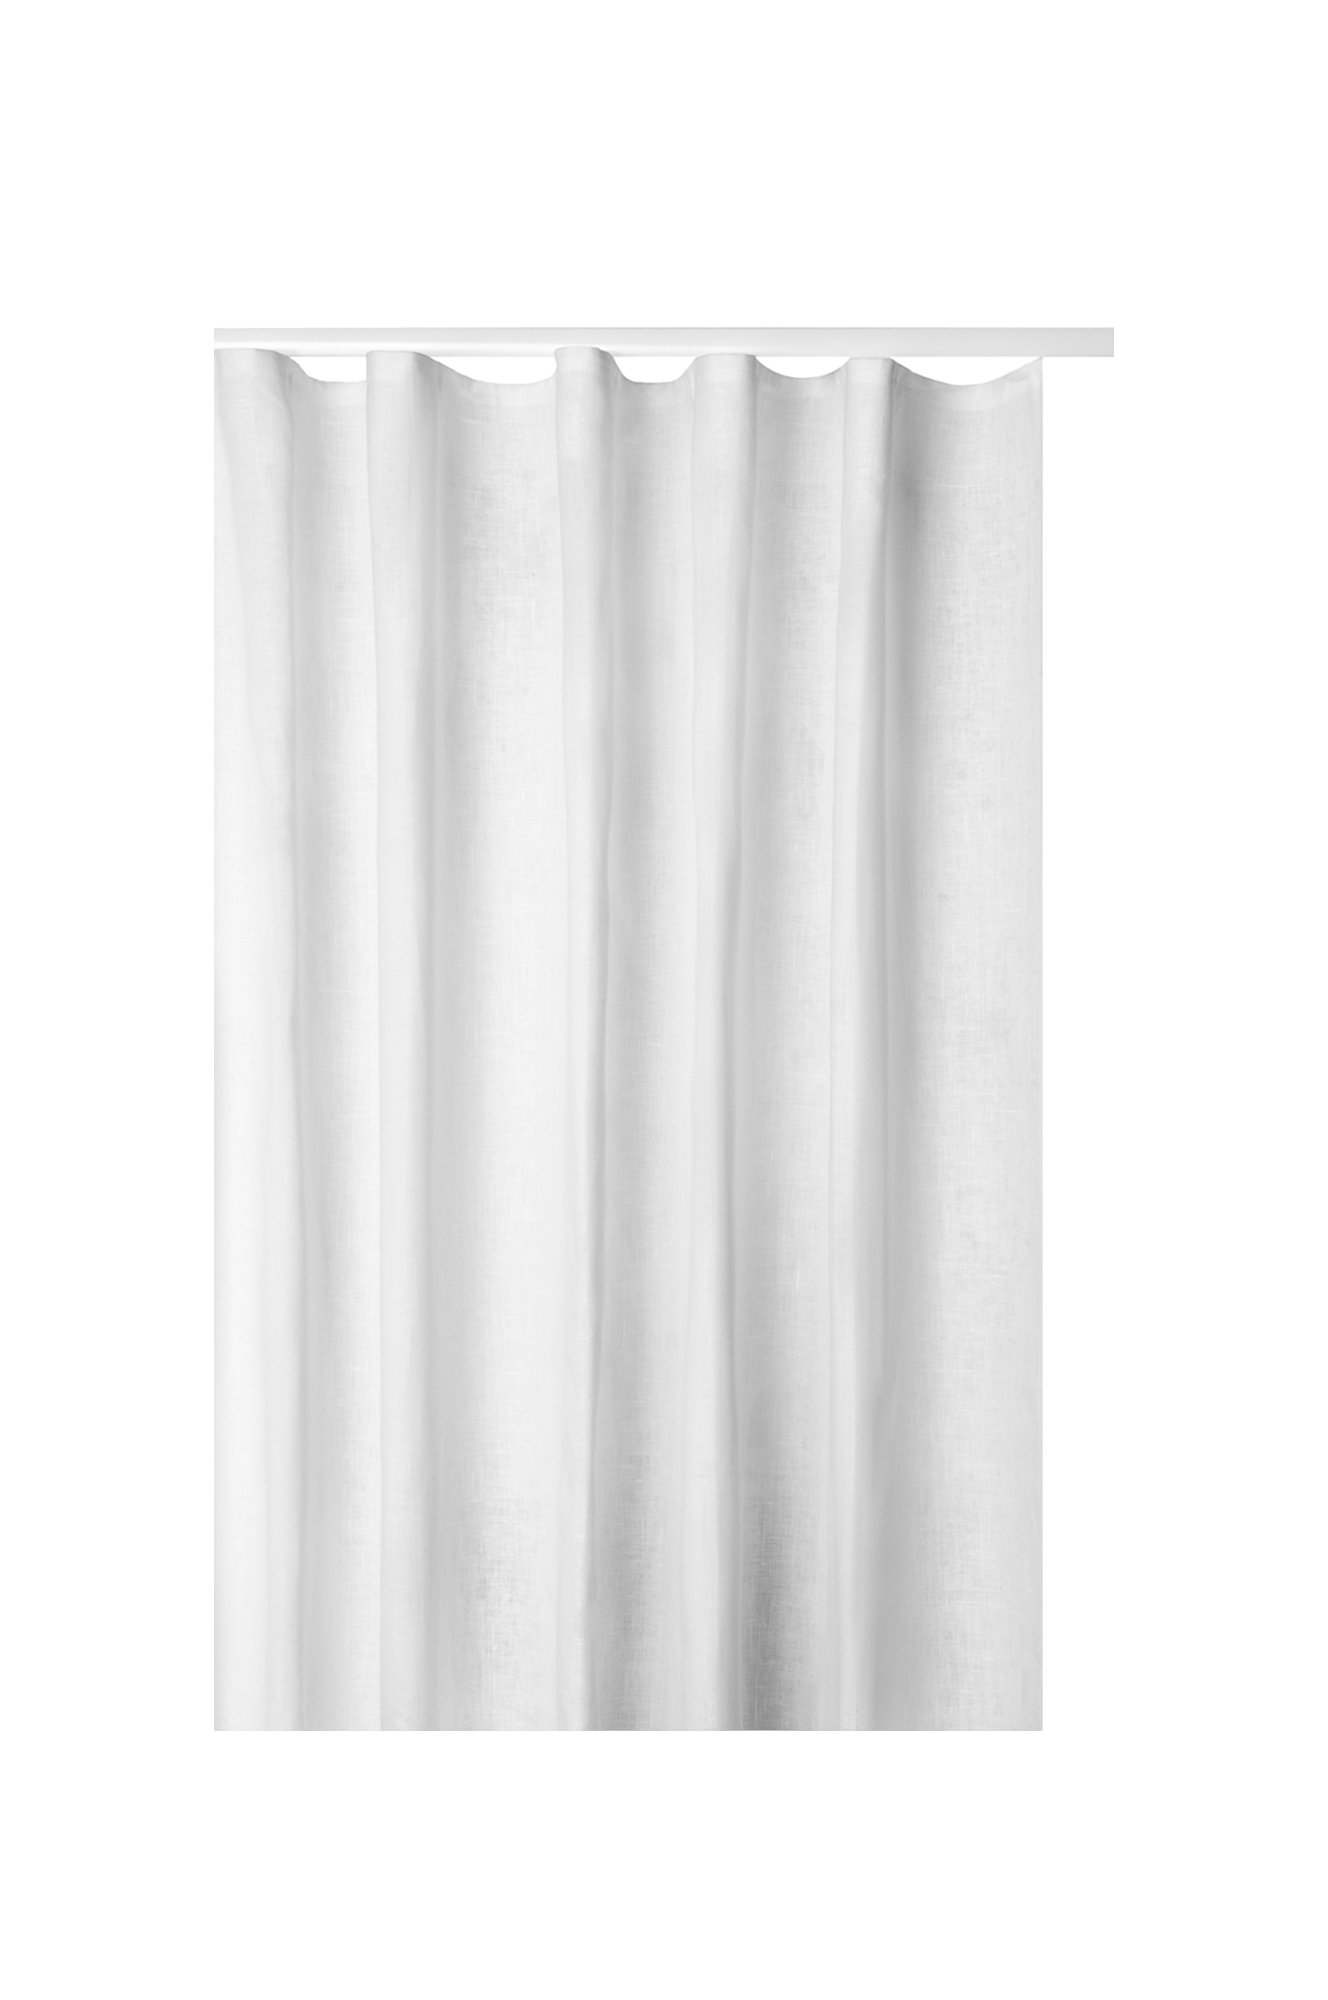 Lilja-verho 145x290 cm